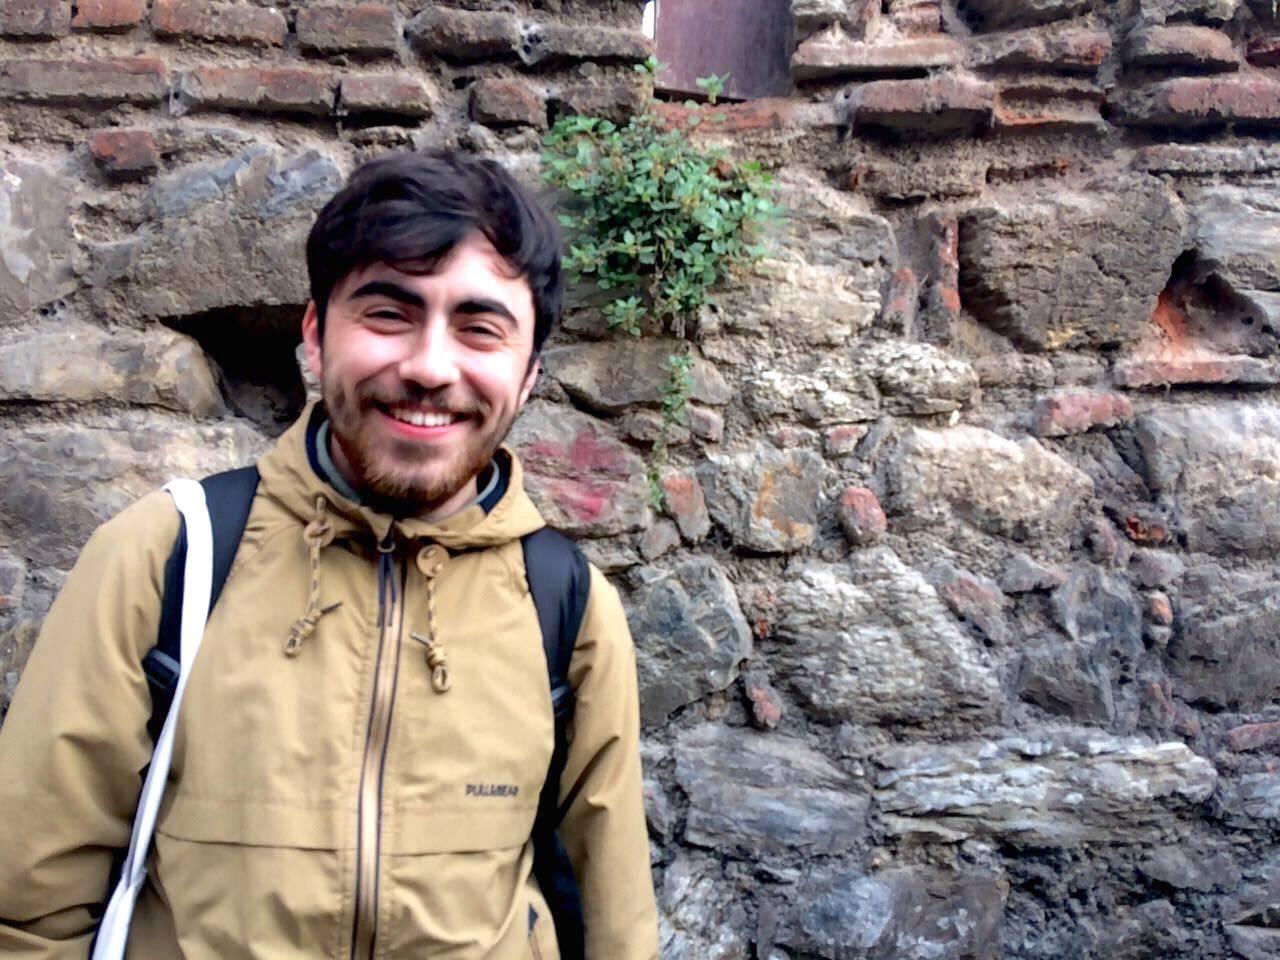 Mustafa-Halil-Aydin